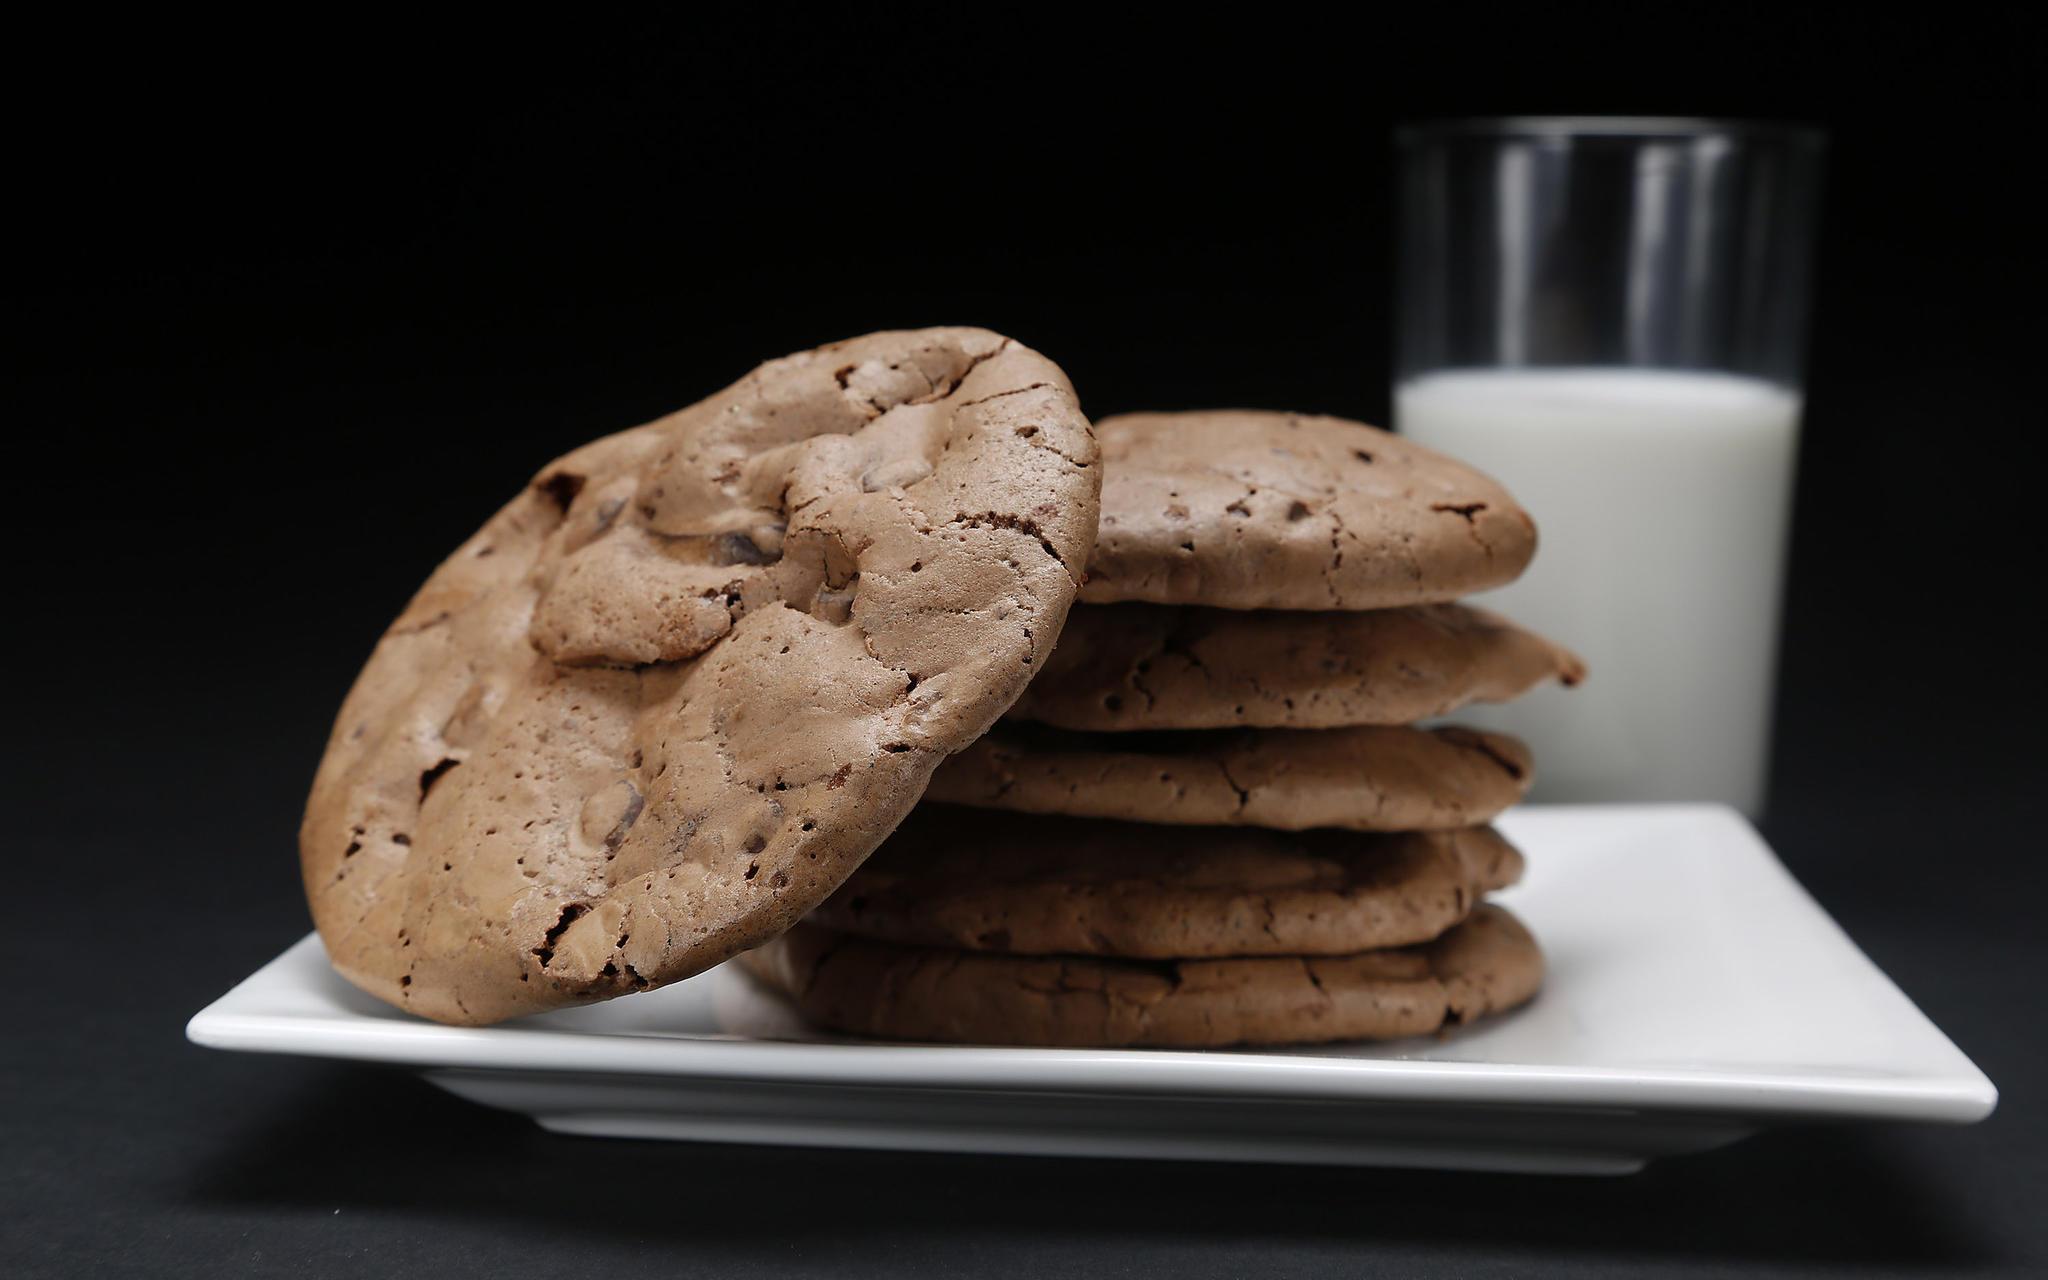 Andrei's chocolate cookies